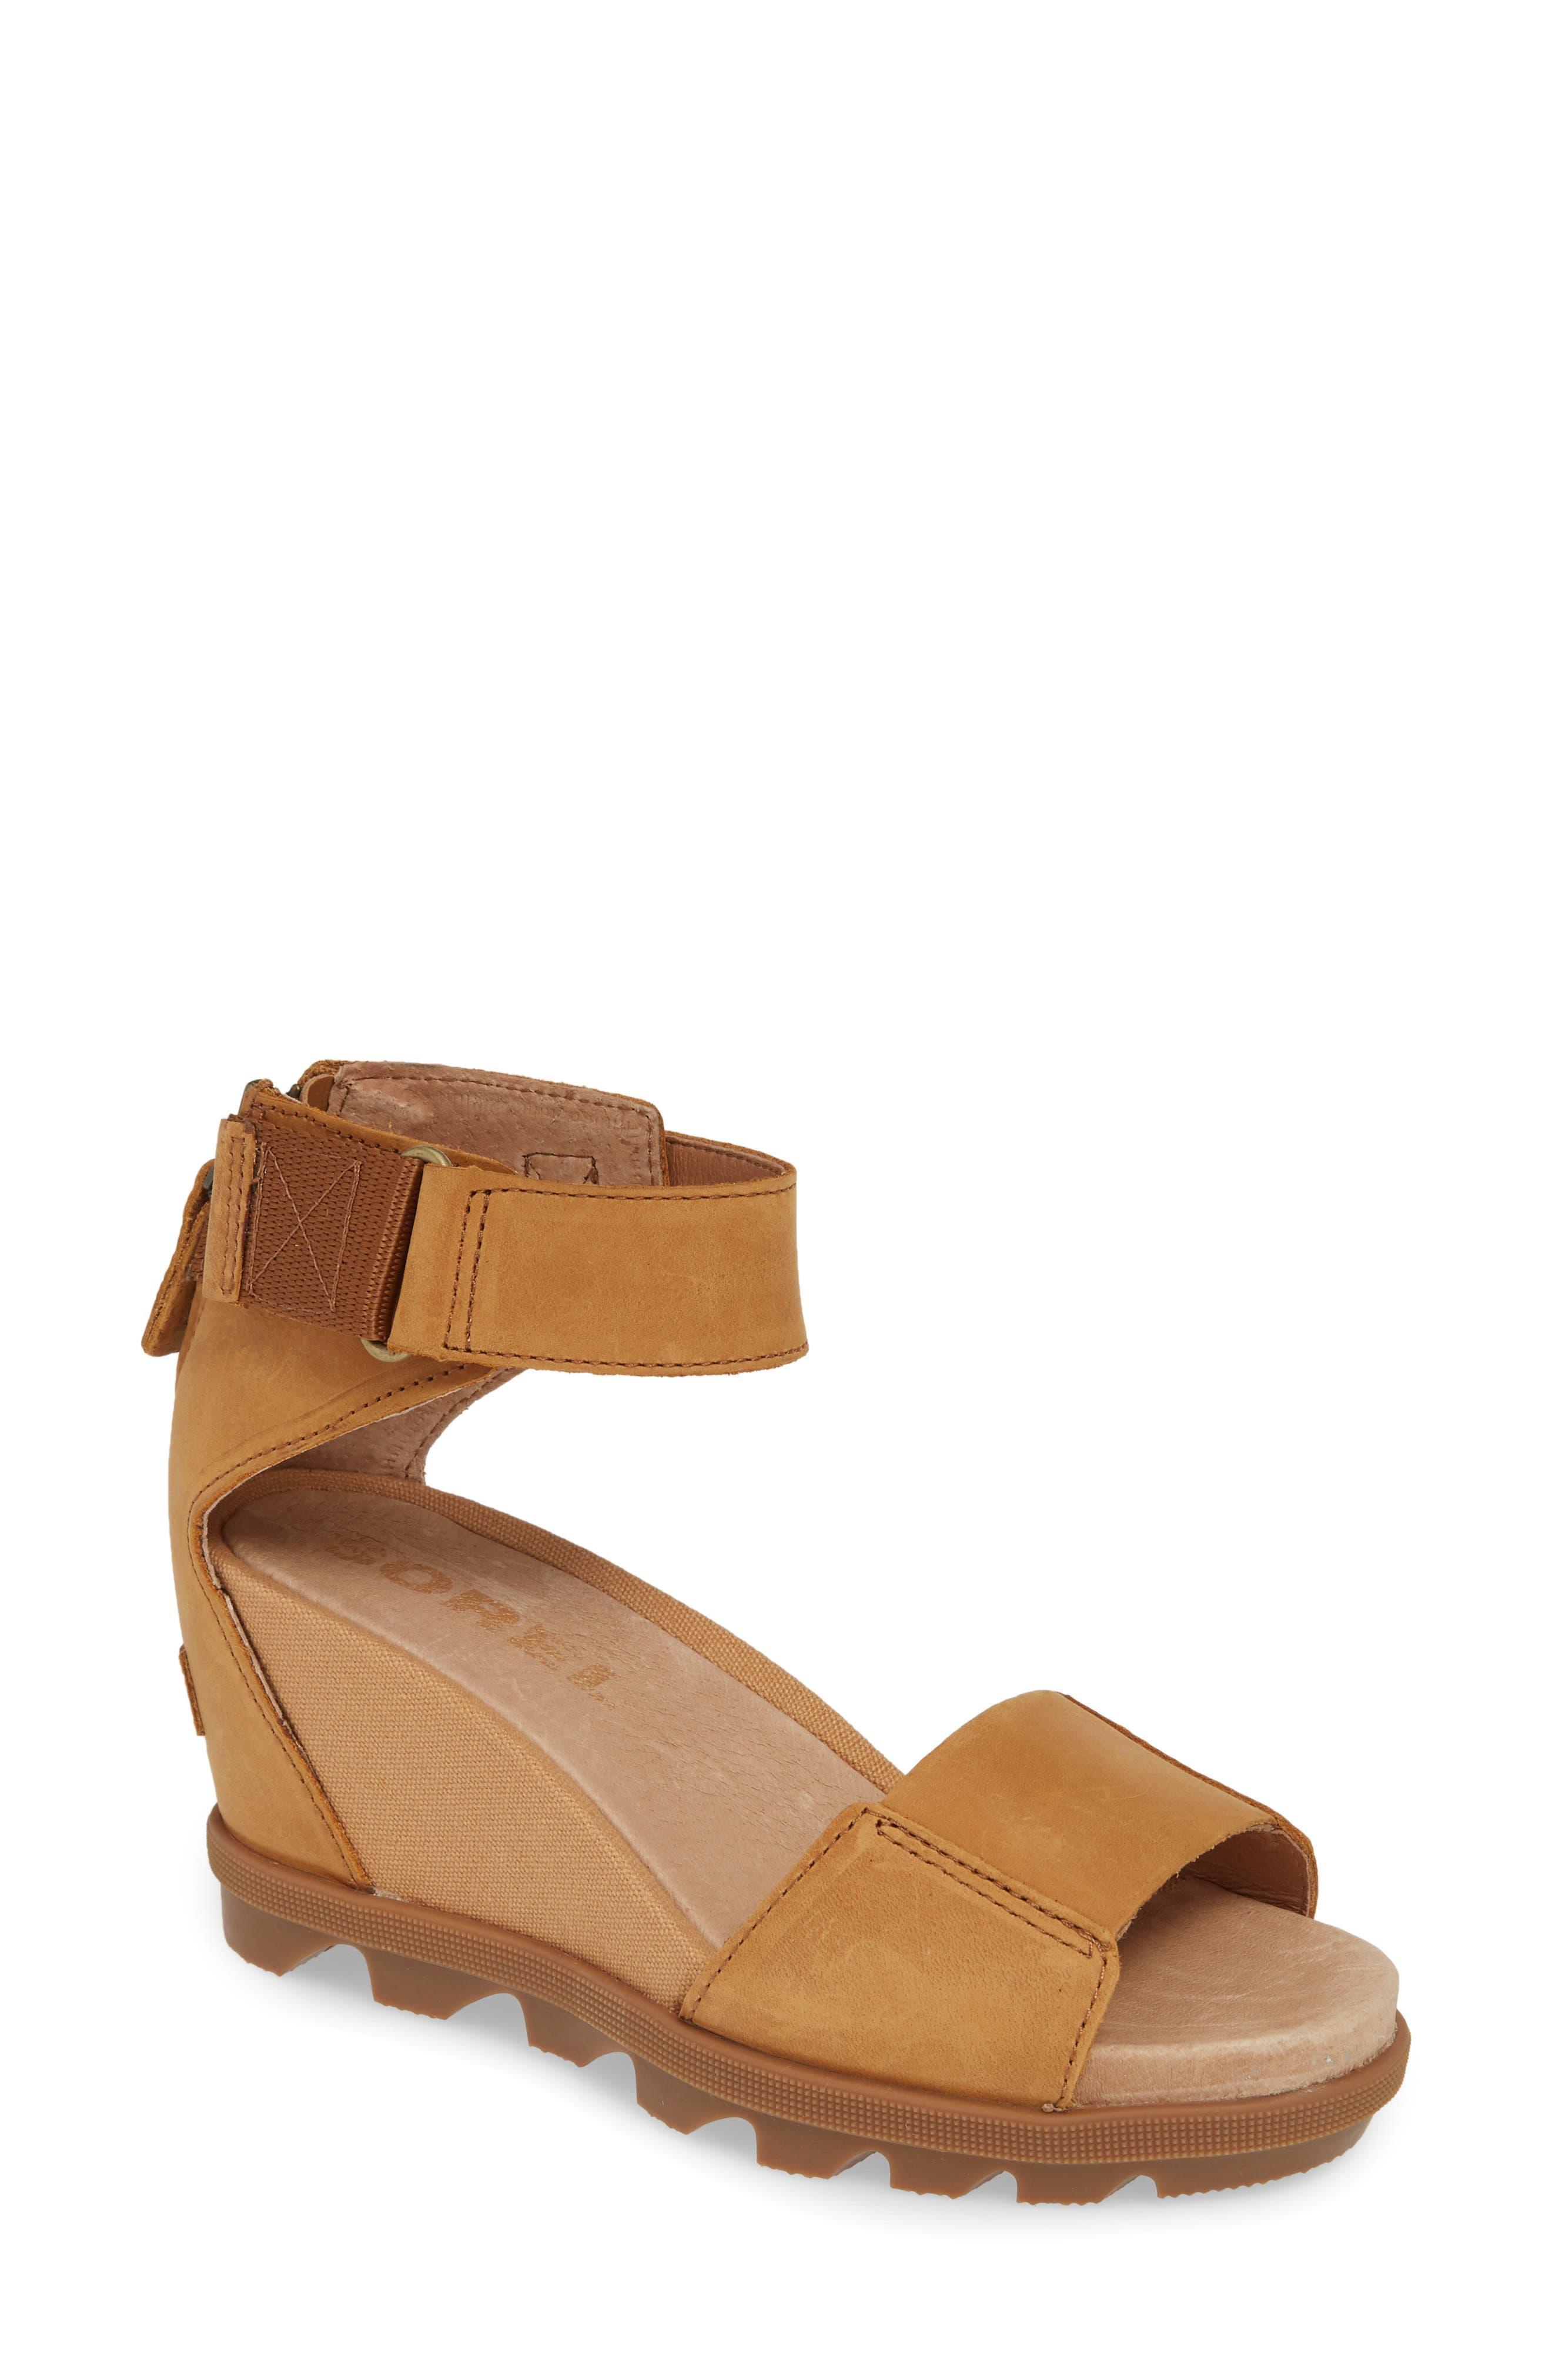 1f92d744e Women s SOREL Wedge Sandals